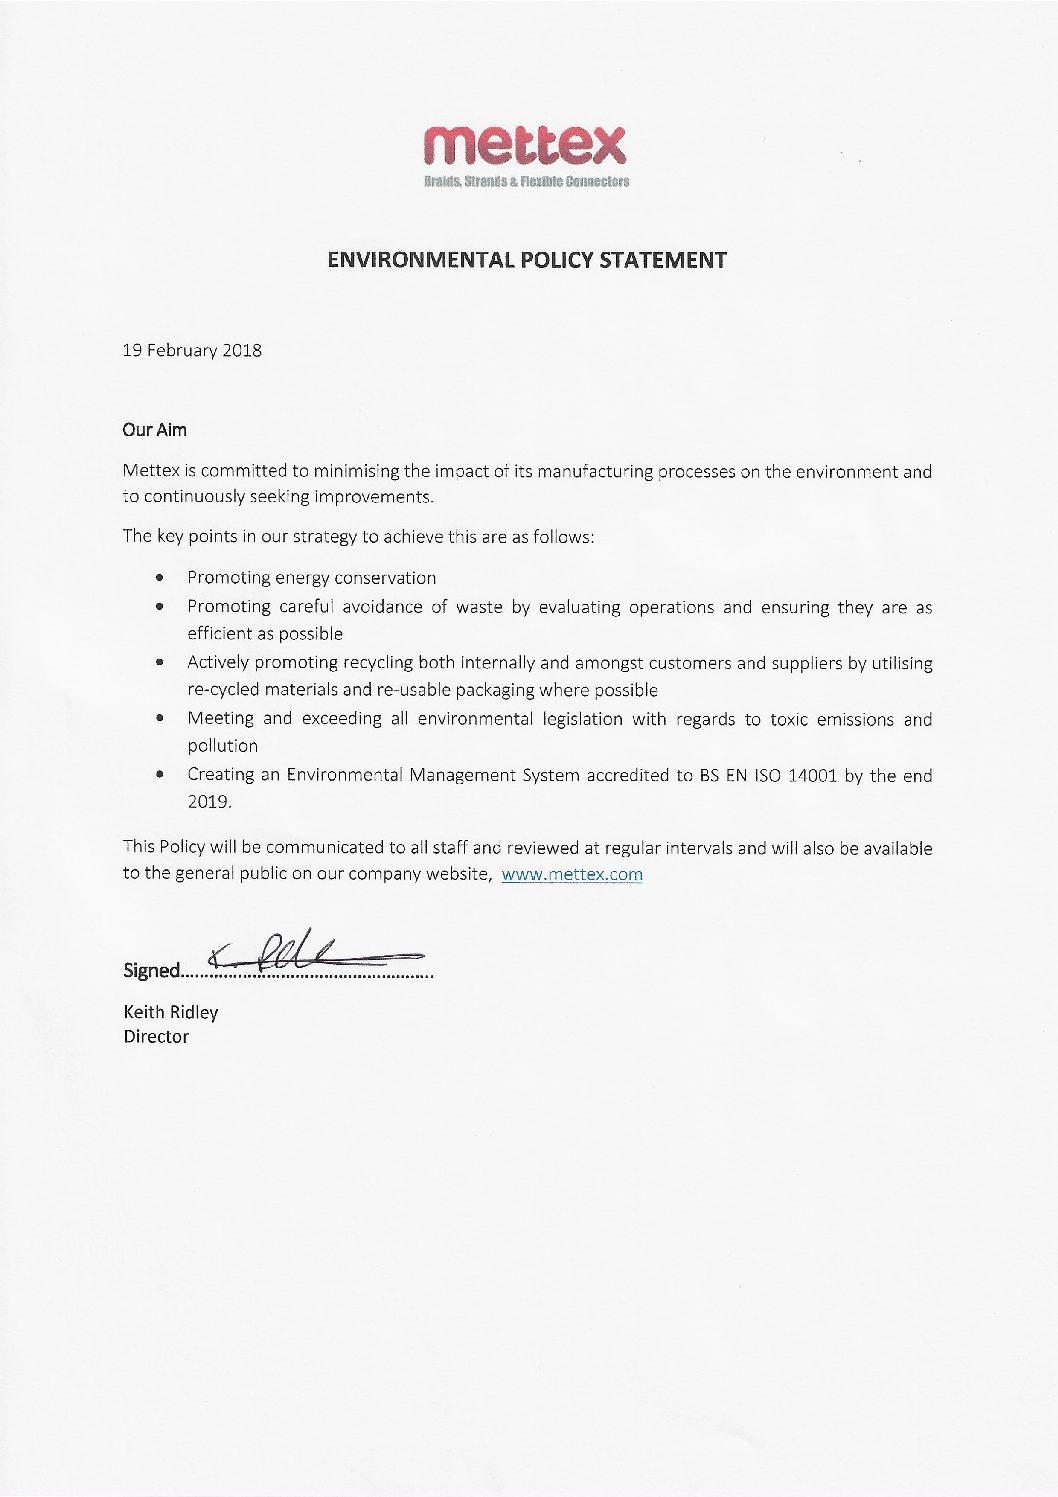 ENVIRONMENTAL-POLICY-STATEMENT-2018-pdf - Mettex